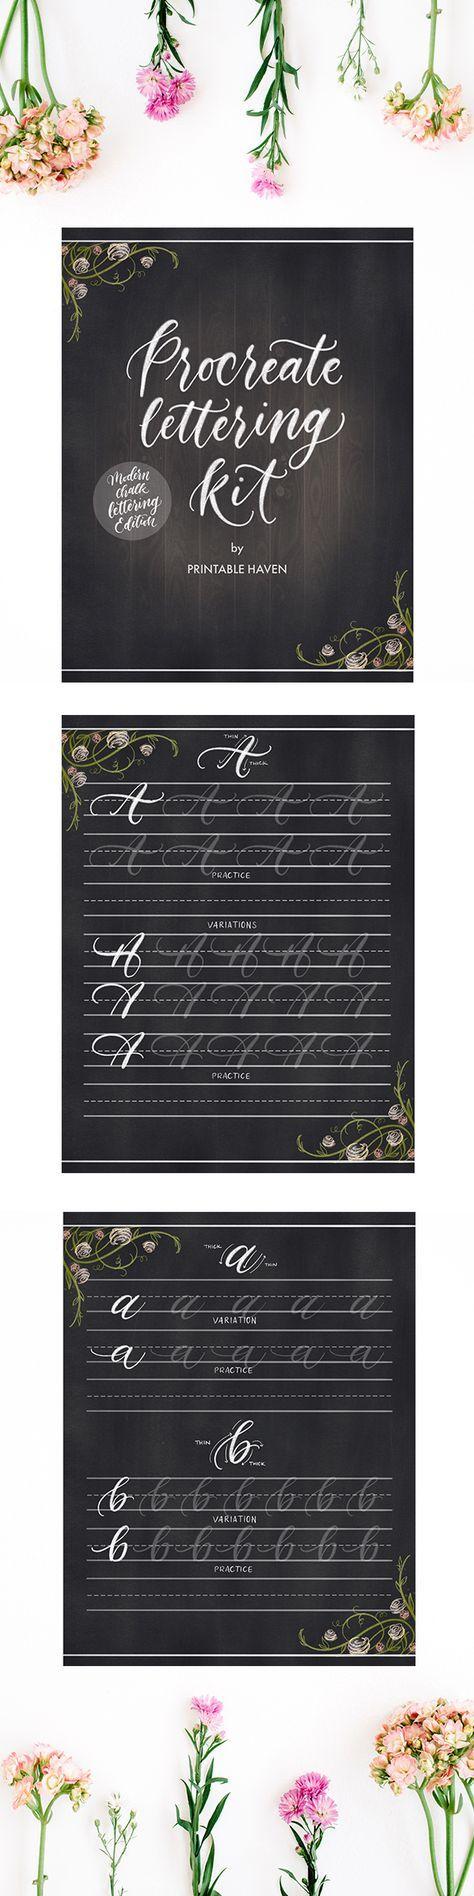 5035a6bbda349f4b29d08c45d5ea9e9b calligraphy kit modern calligraphy